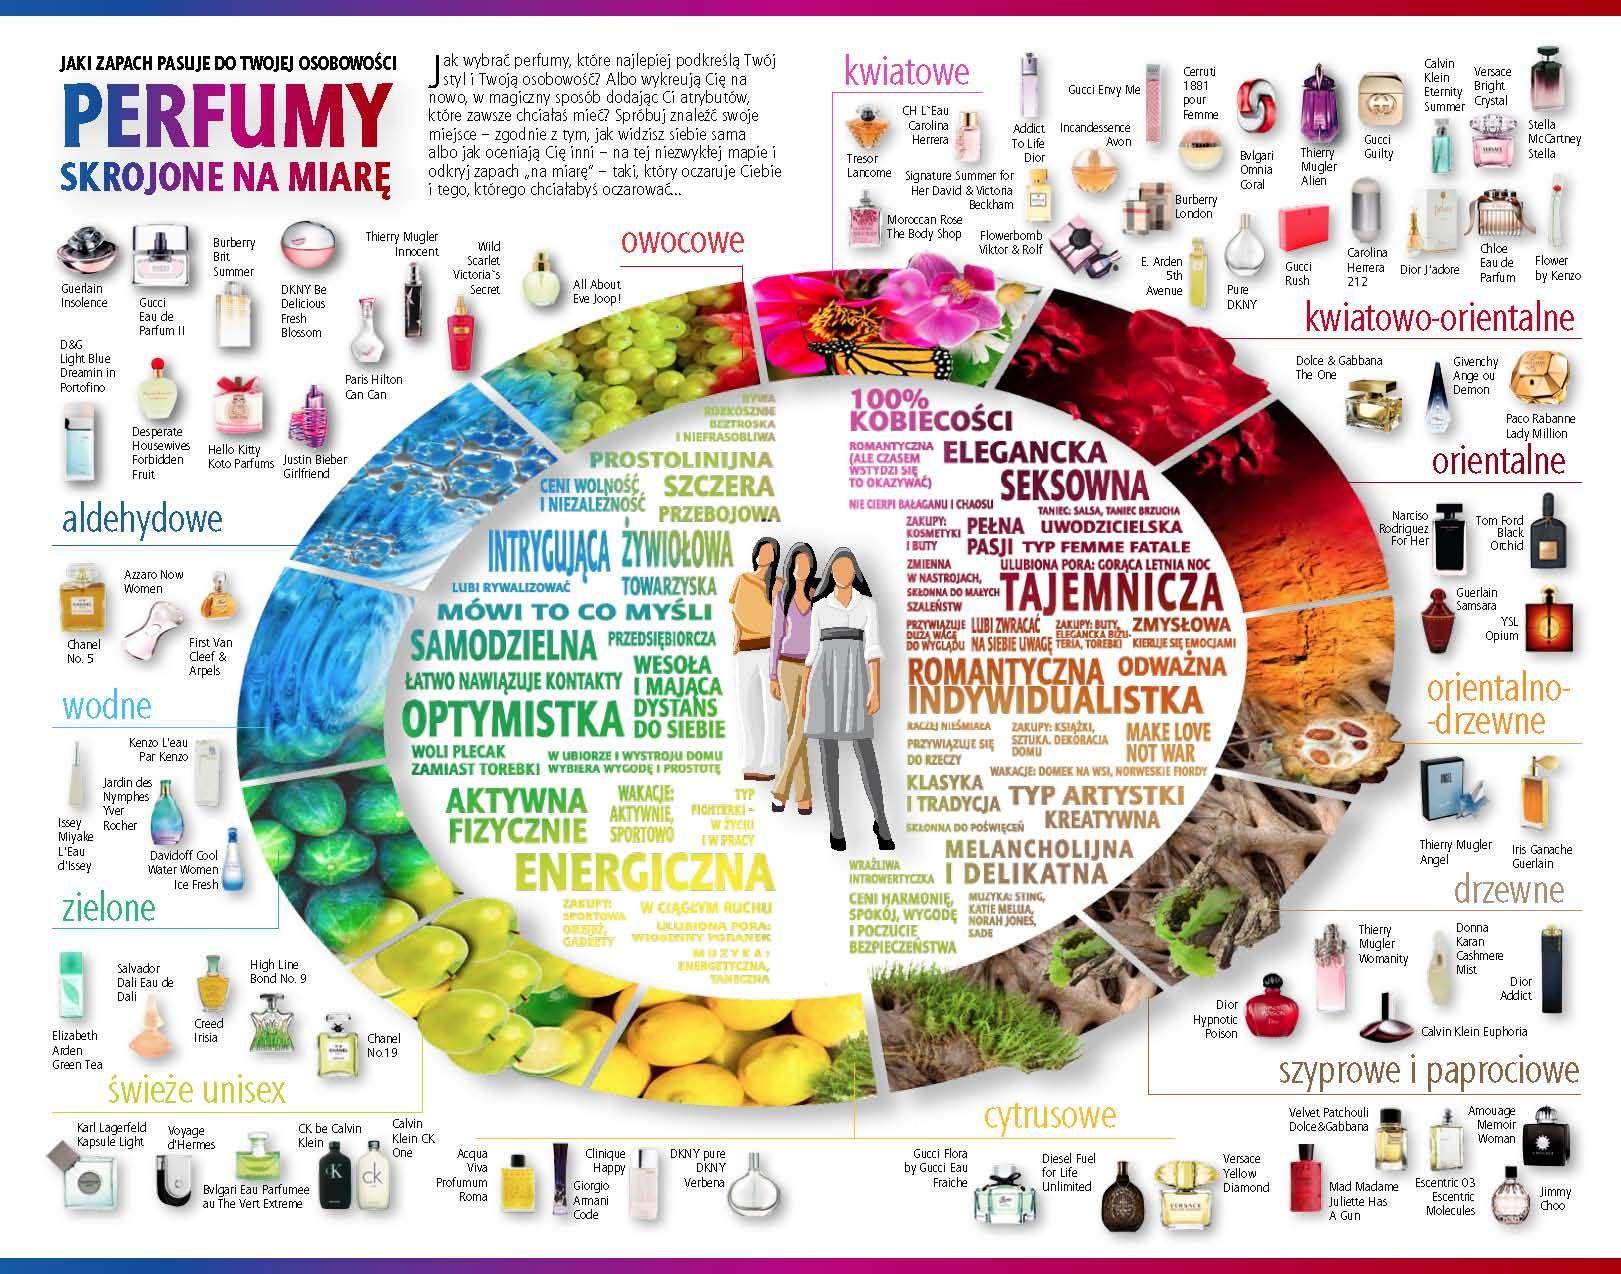 Perfume Notes Vs Personality Pinfographics Perfume Perfume Making Natural Perfume